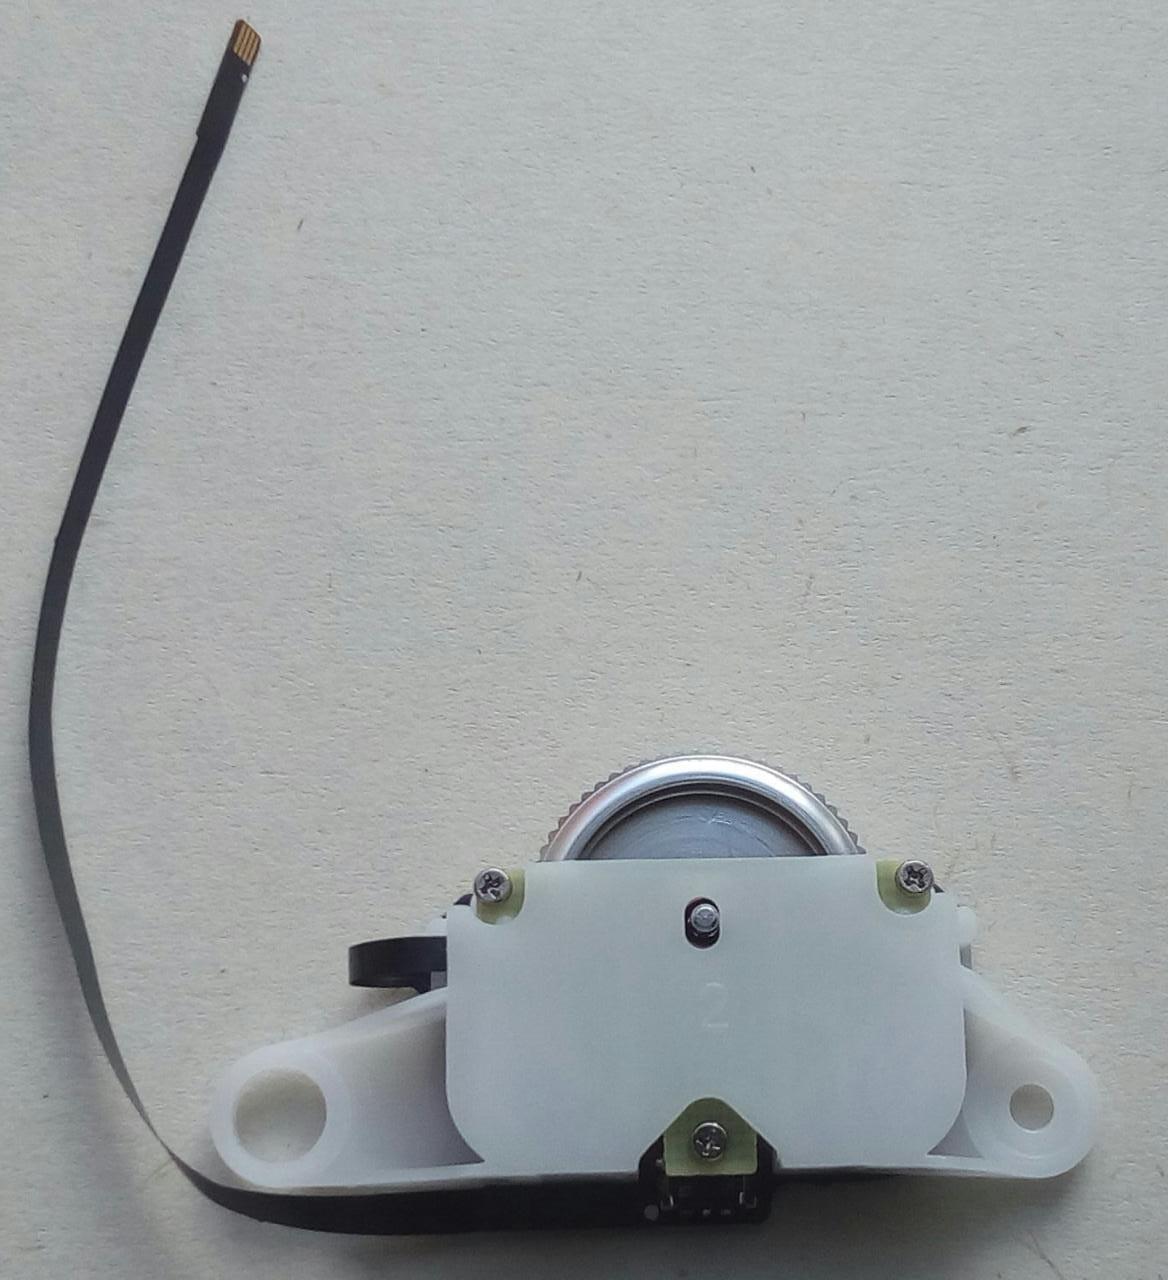 DJI Phantom 4 Pro – Remote Controller Camera Settings Dial